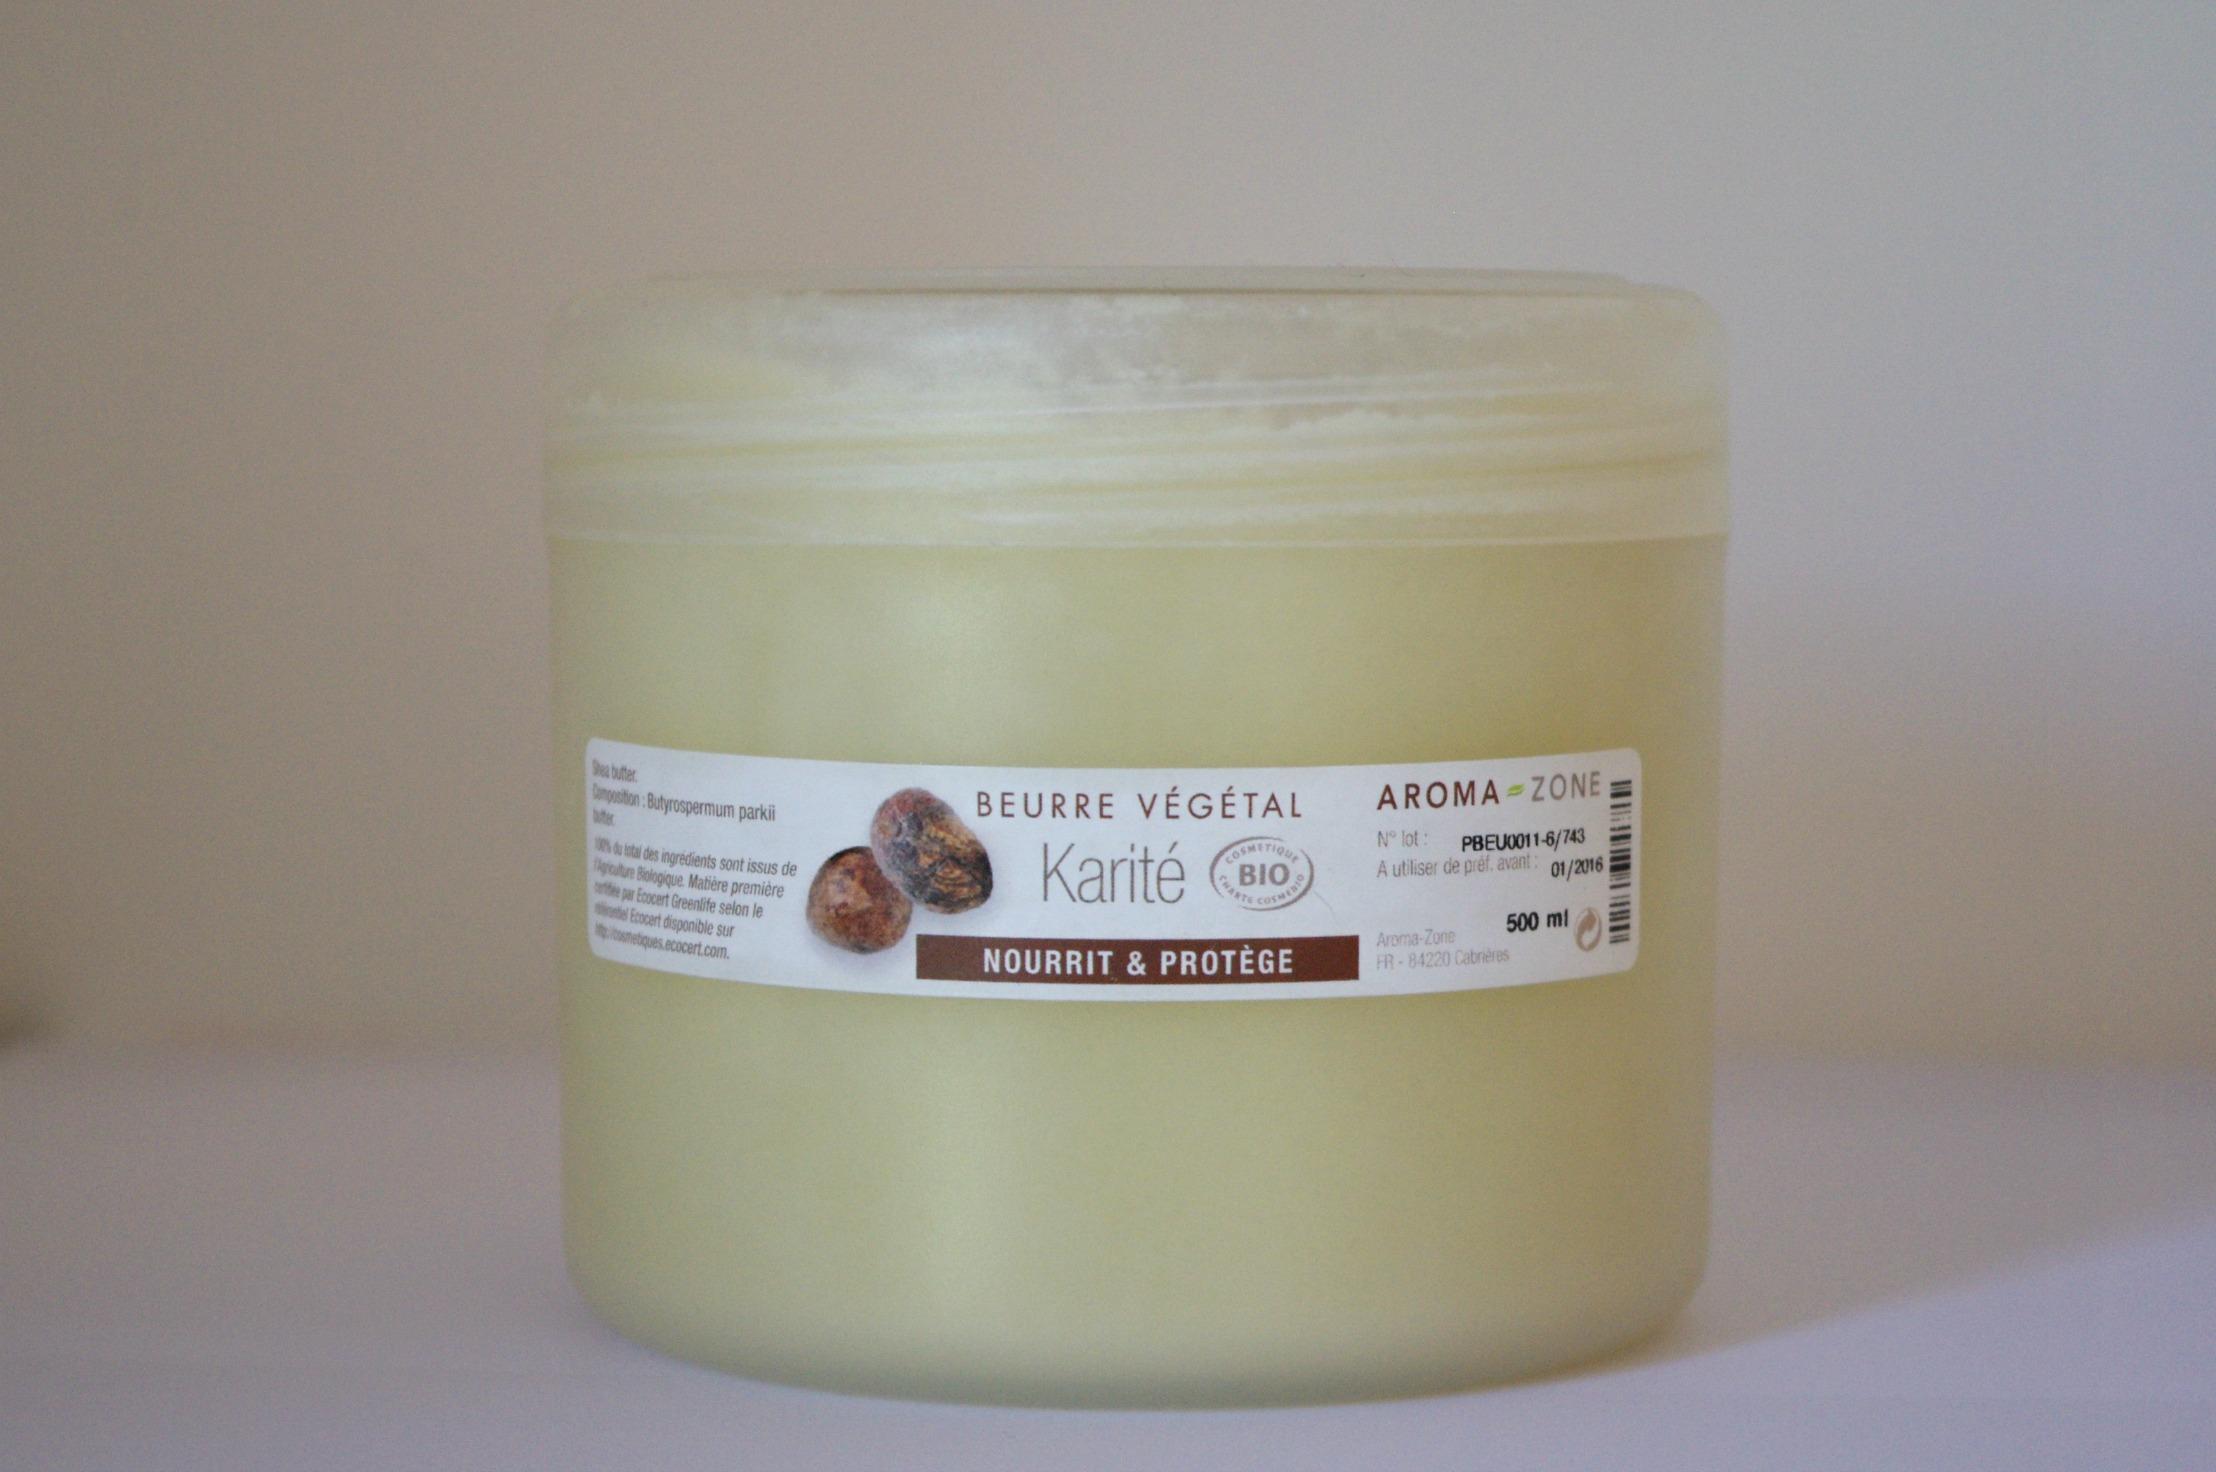 beurre-karite-aroma-zone